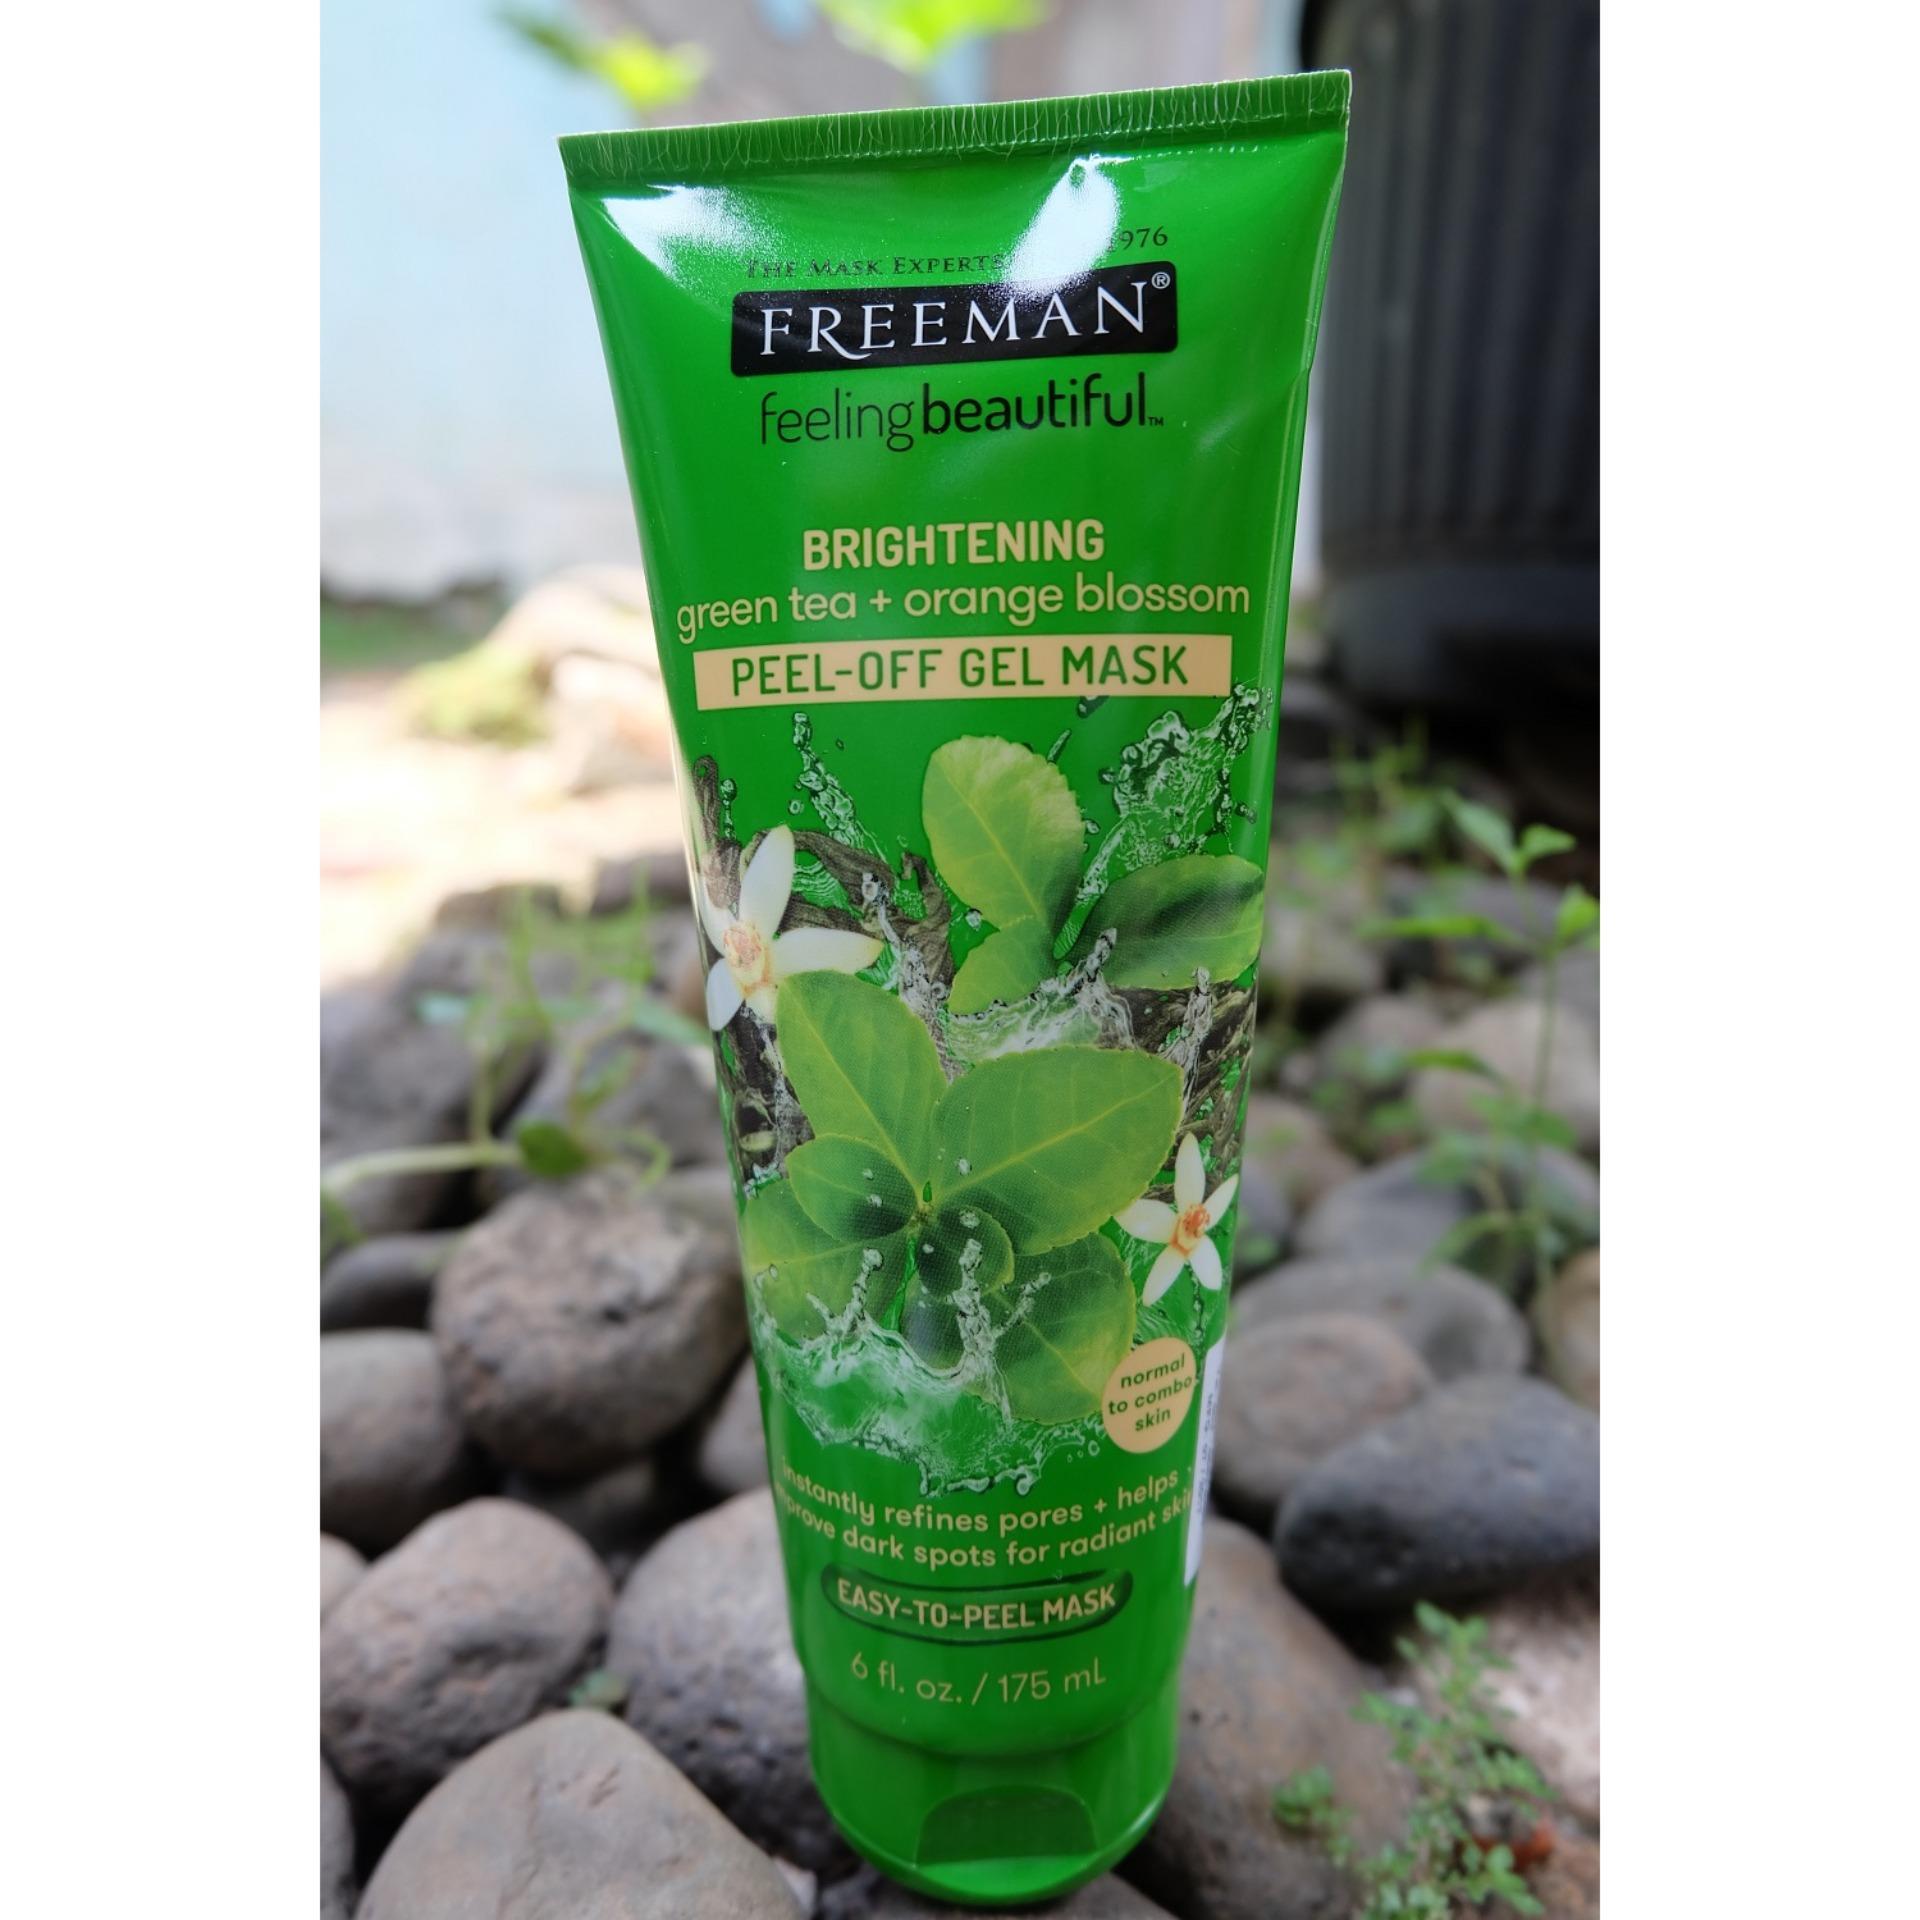 Promo Terlengkap Baygon Aerosol Tea Blossom 600ml Di Toko Online Parfum Original Jeanne Arthes Boum Green Cherry For Women Edp 100ml Freeman Mask Orange 2